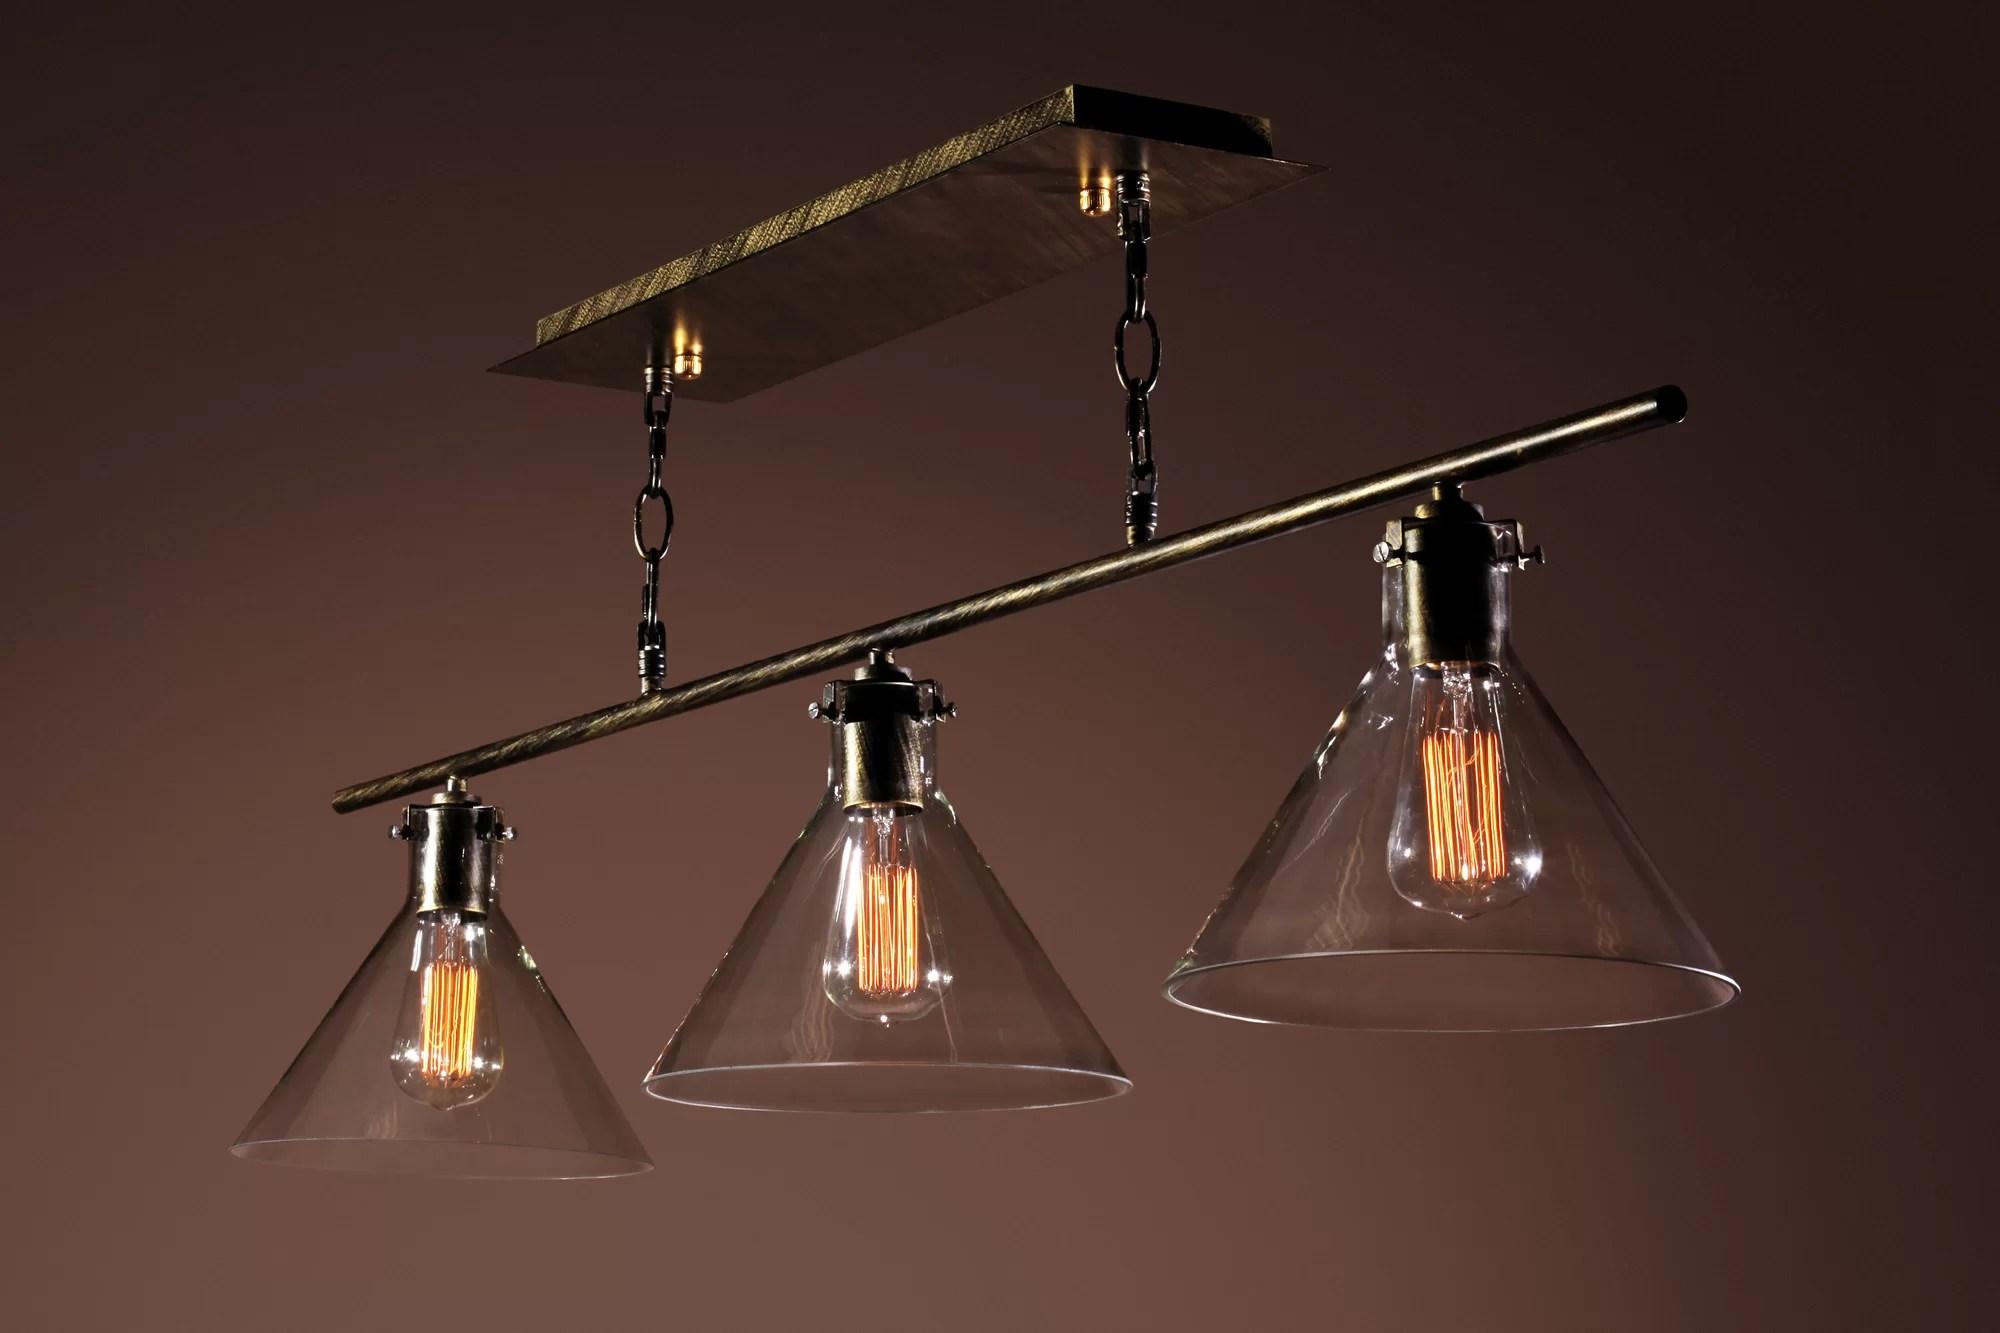 3 light kitchen island pendant cheap cabinets sale warehouse of tiffany amerie